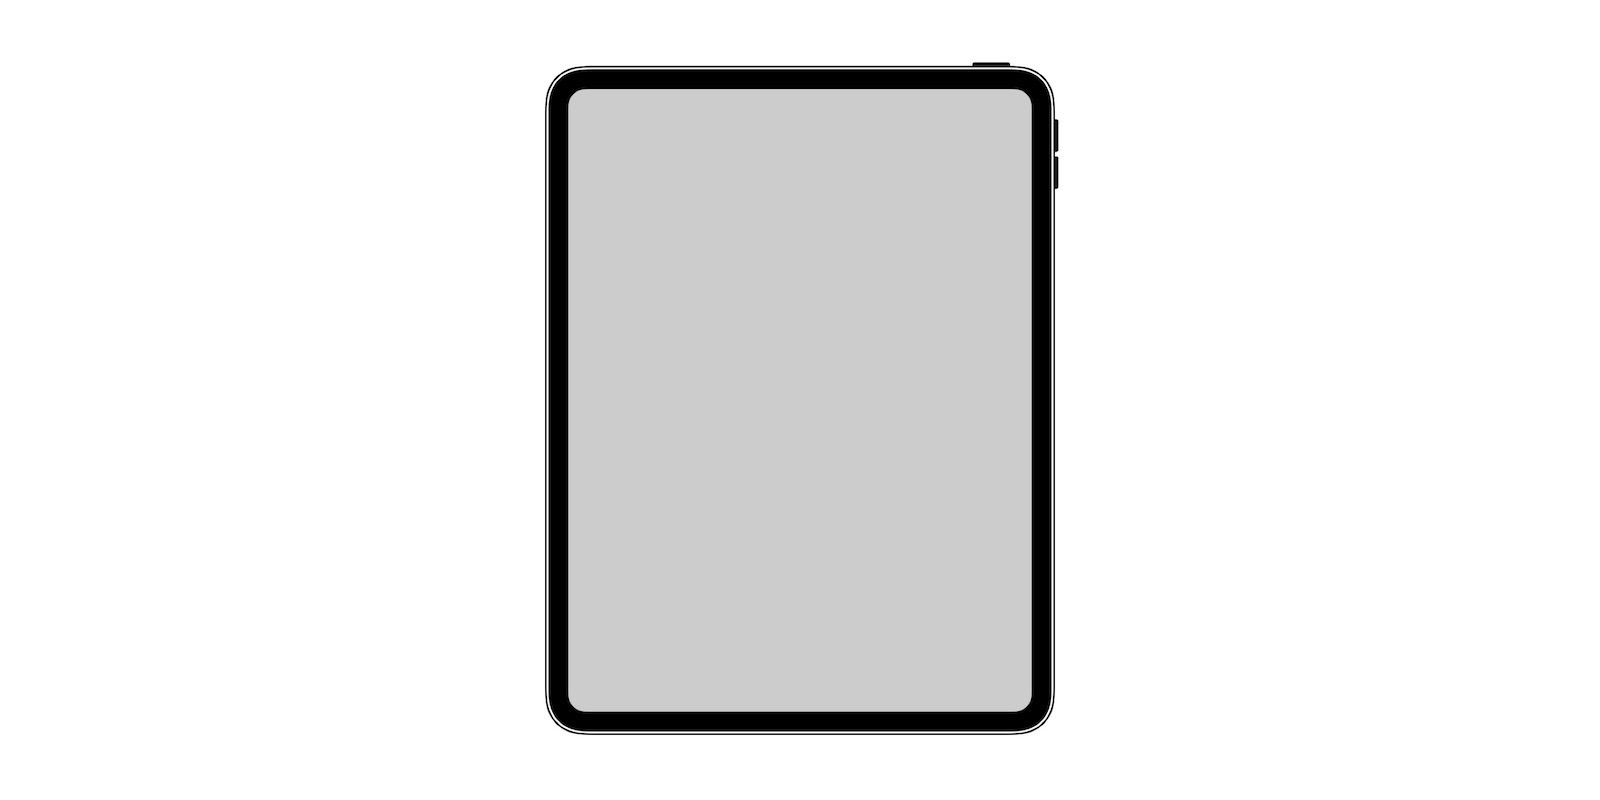 Ipadpro2018 icon found again